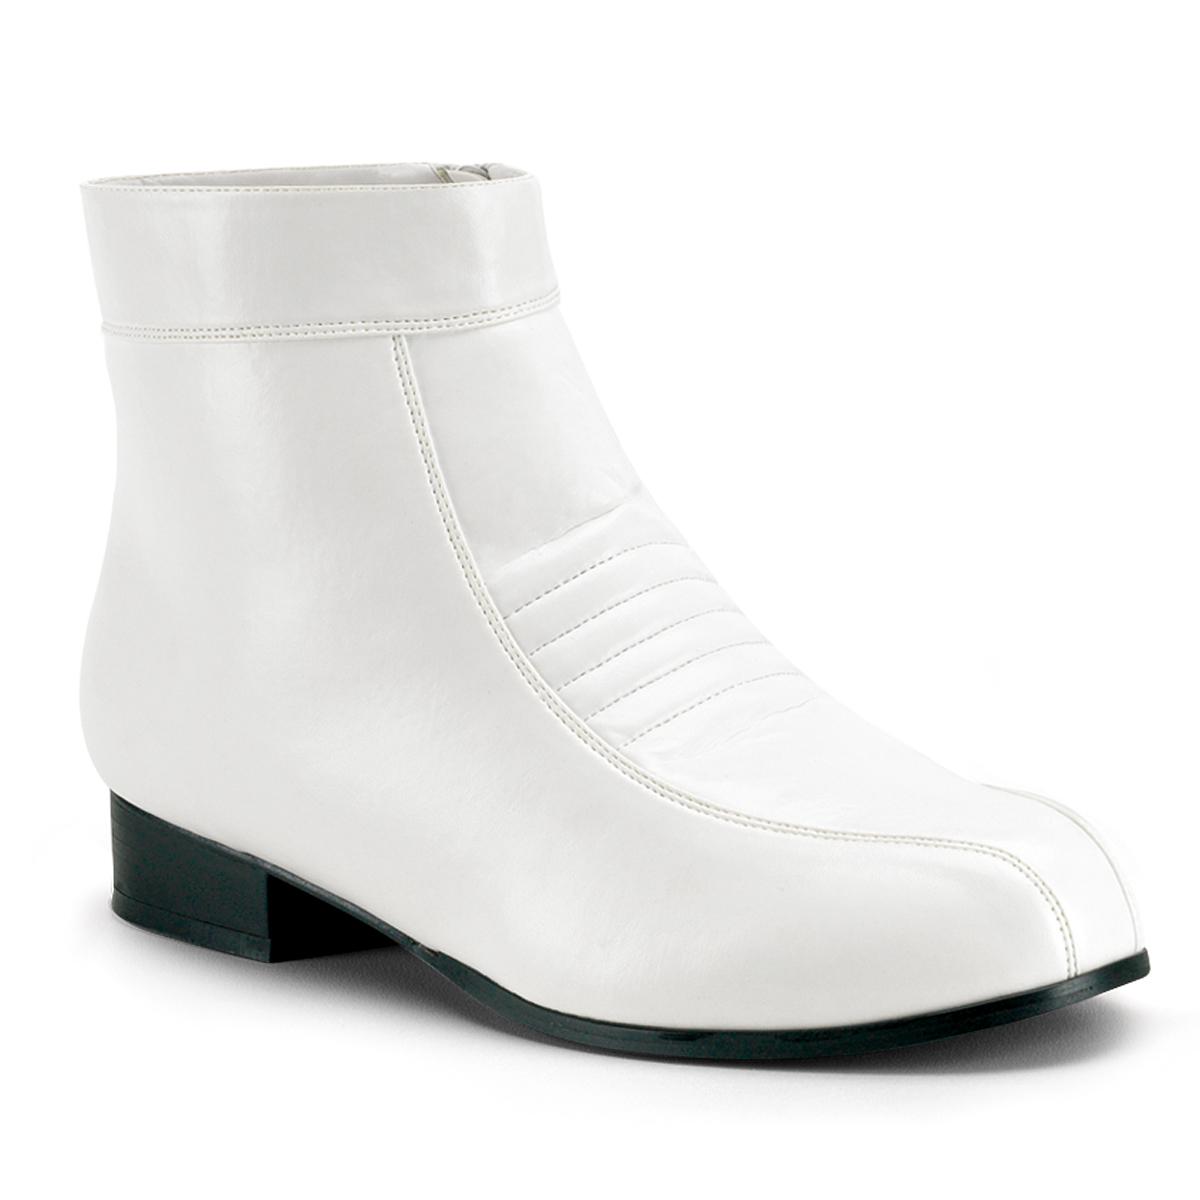 online store dbe3b 3e750 Men Ankle boots PIMP-50 - White